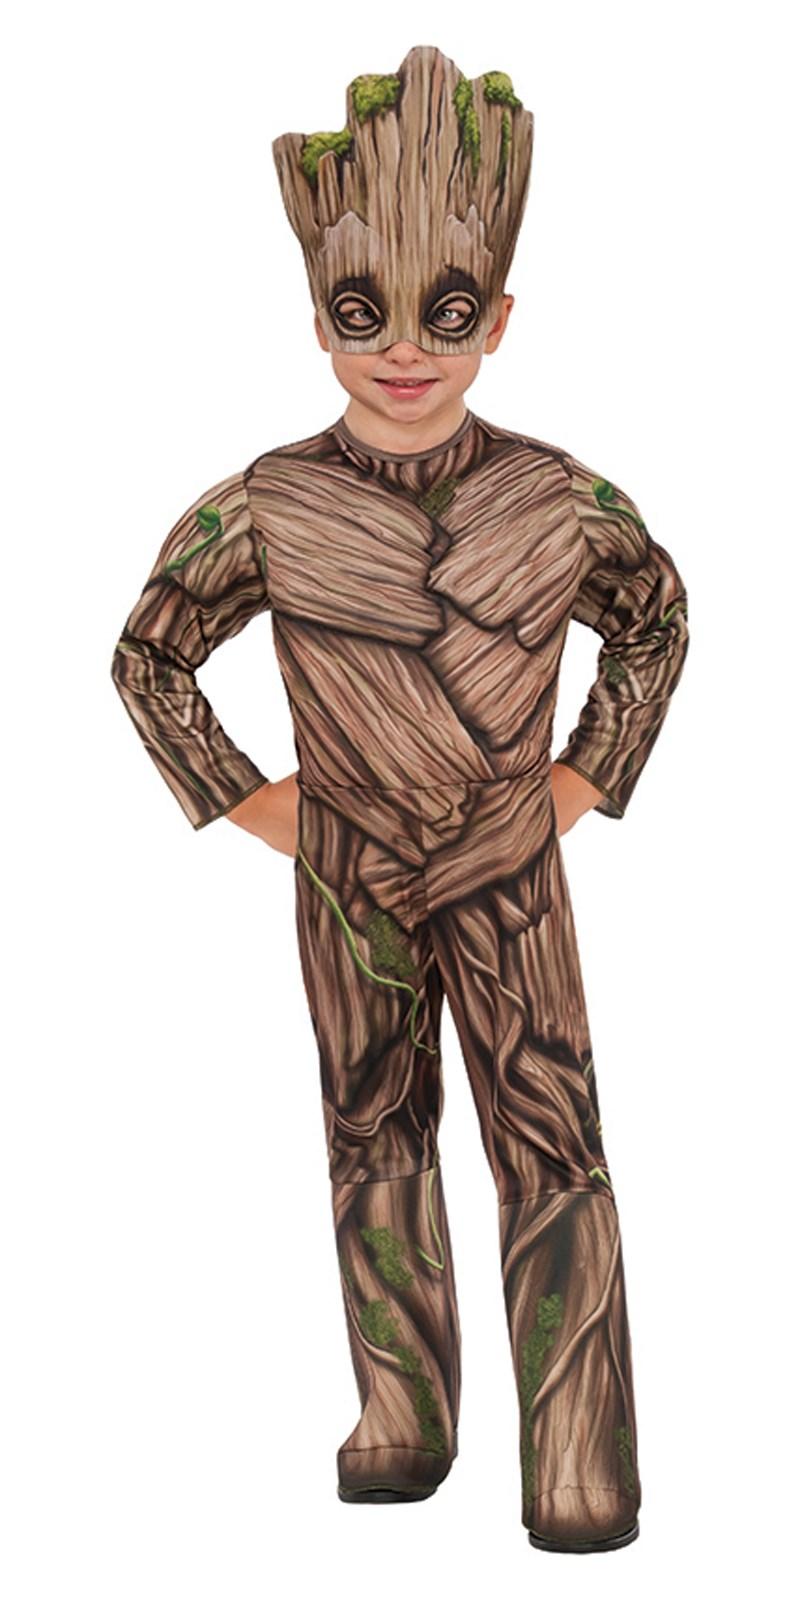 Toddler Halloween Costumes | BuyCostumes.com